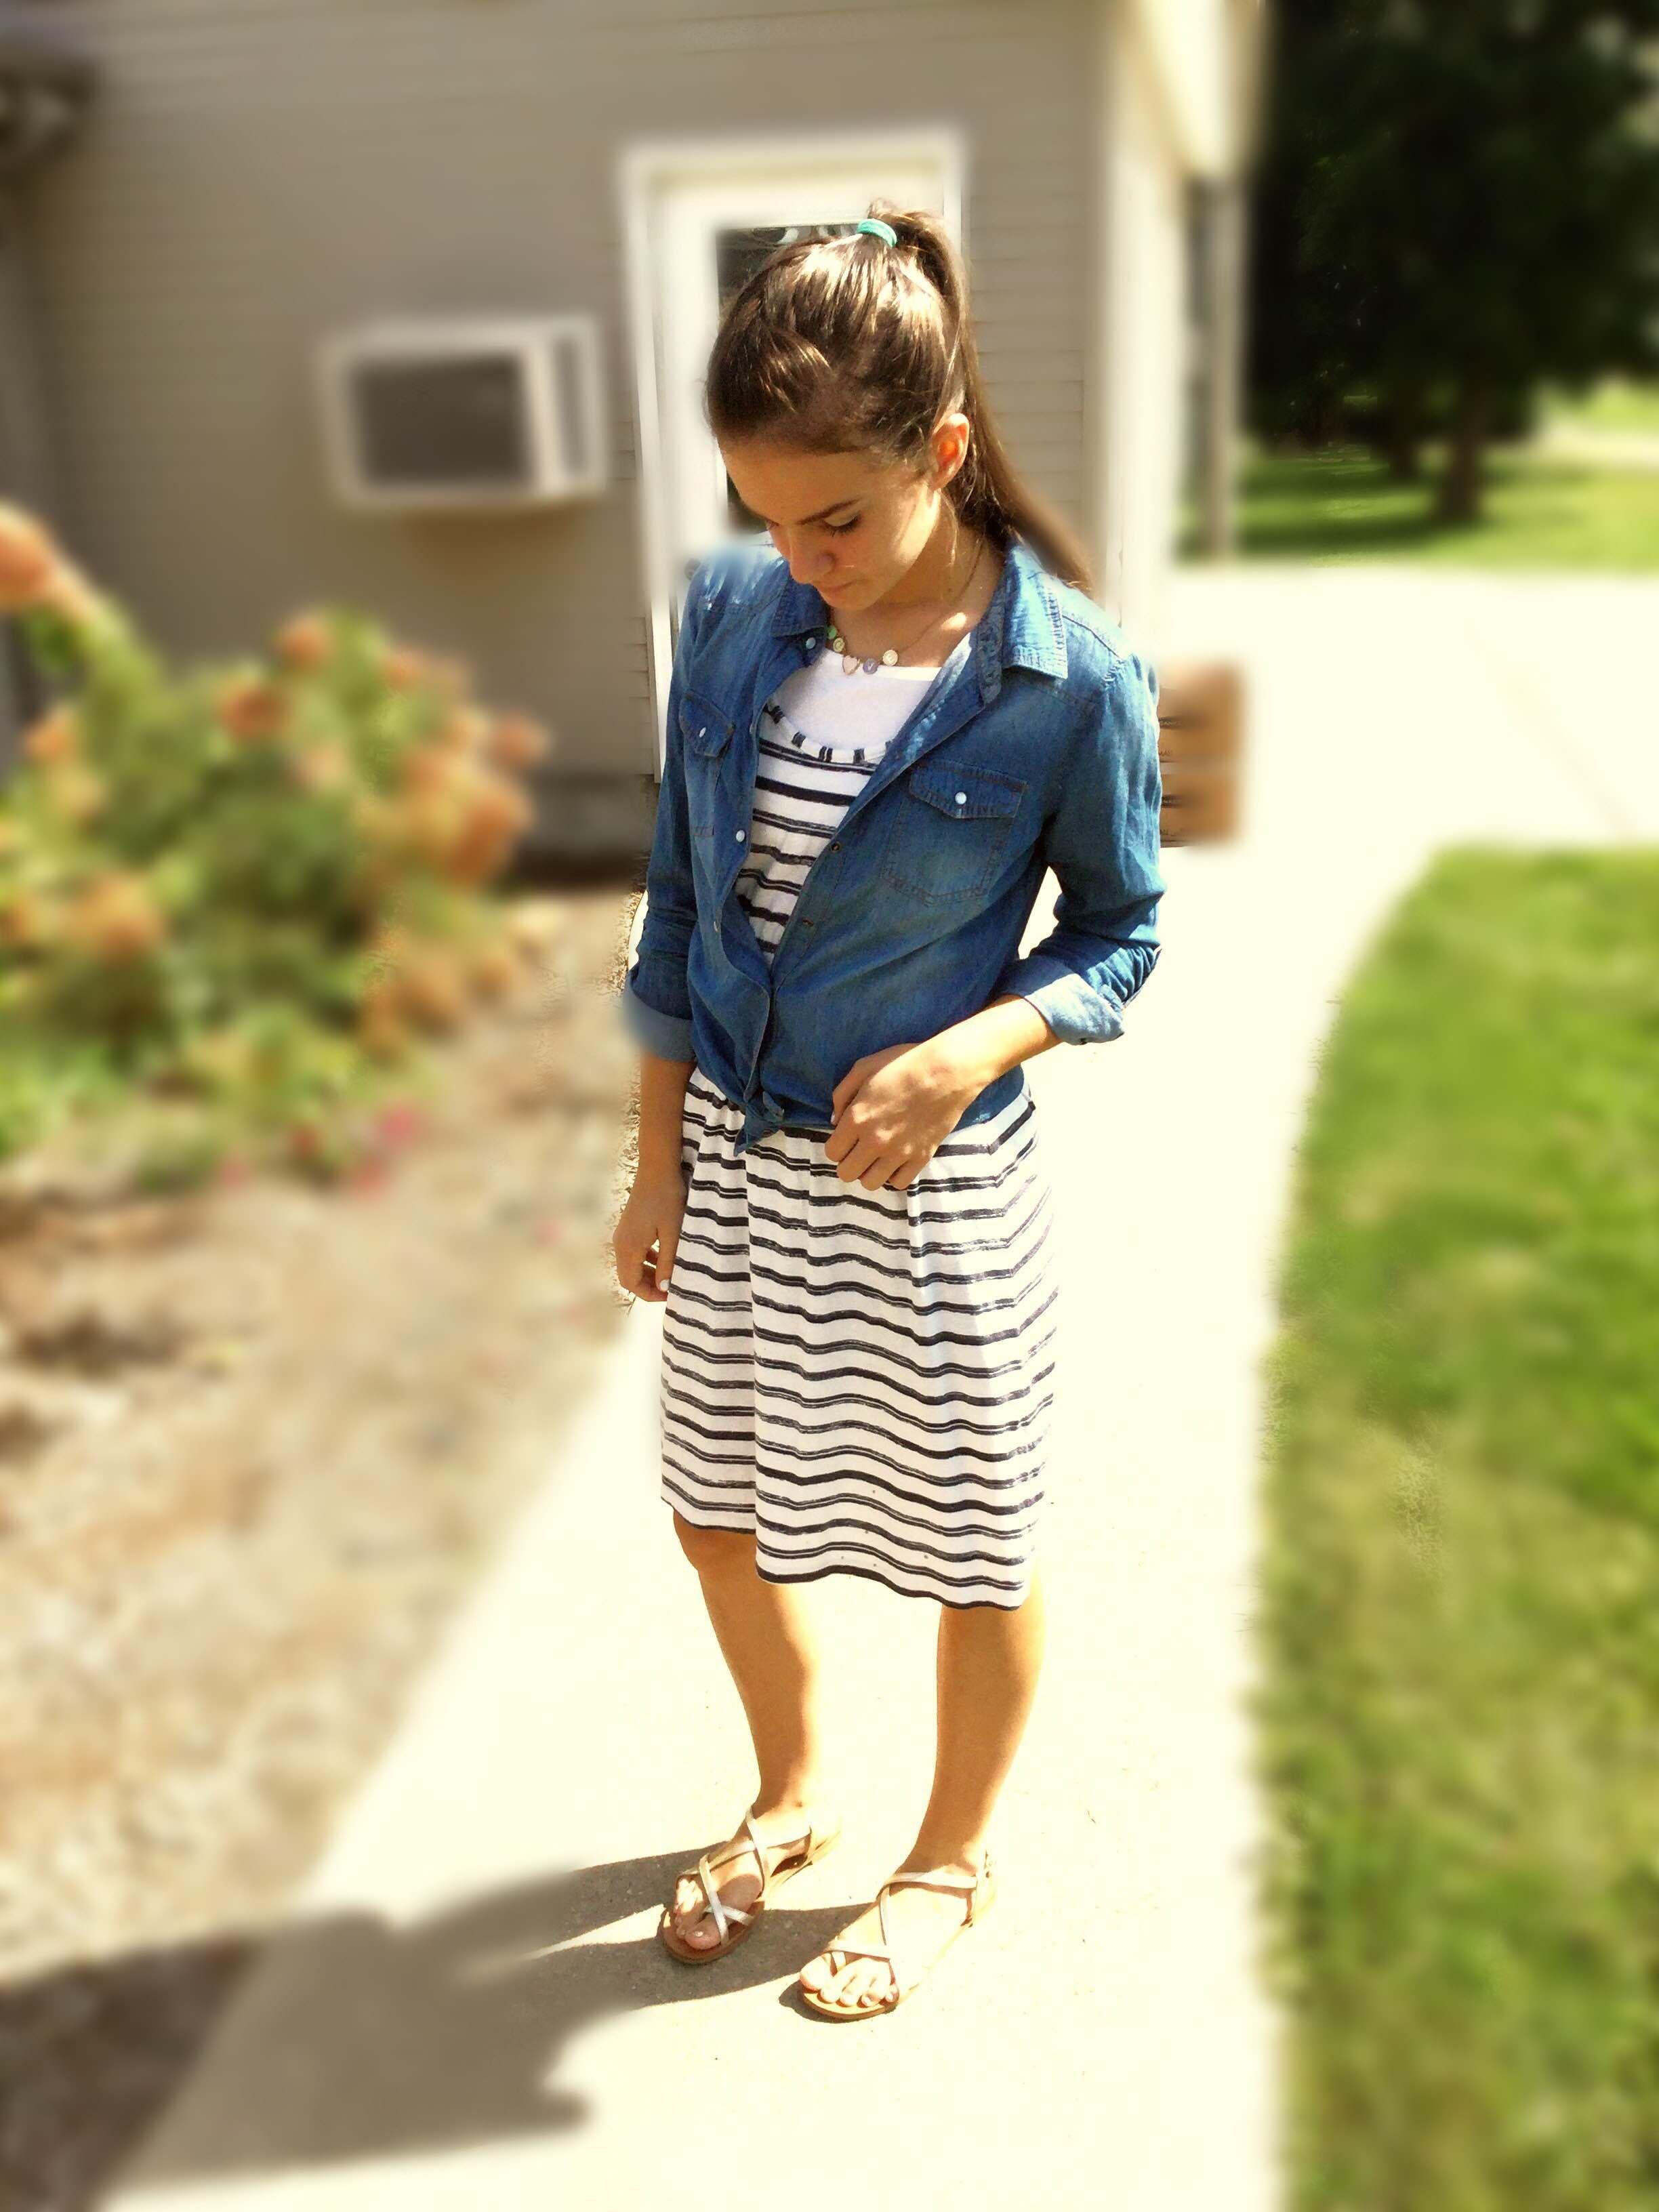 Modest tween and teen clothing